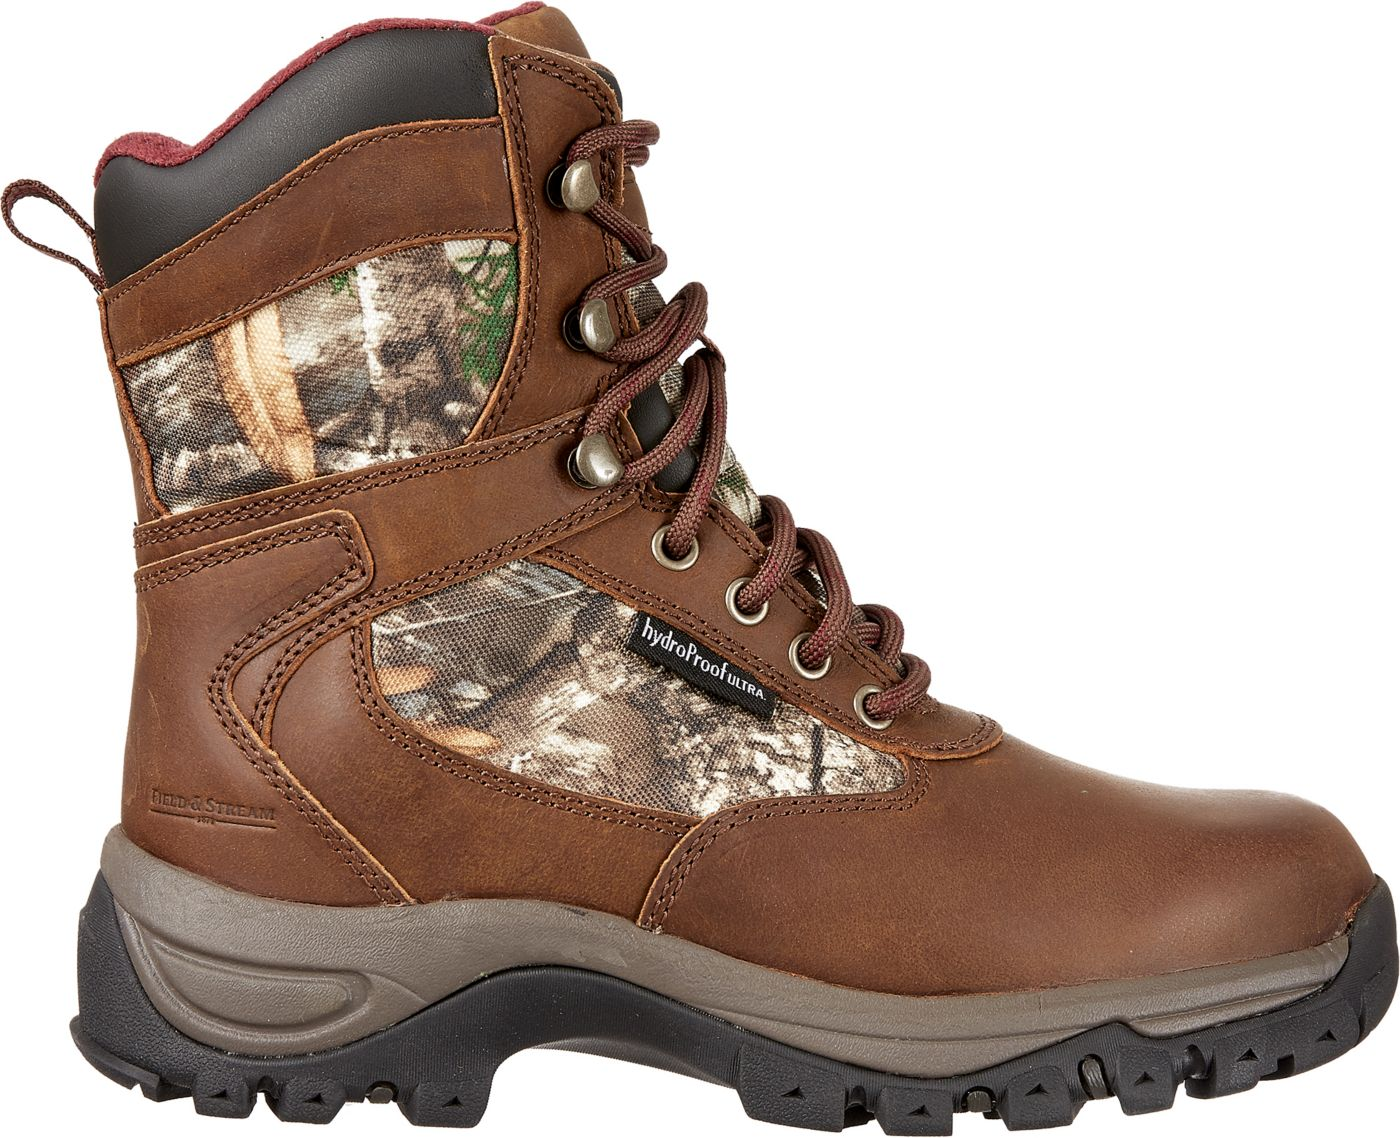 Field & Stream Women's Game Trail 800g Waterproof Hunting Boots